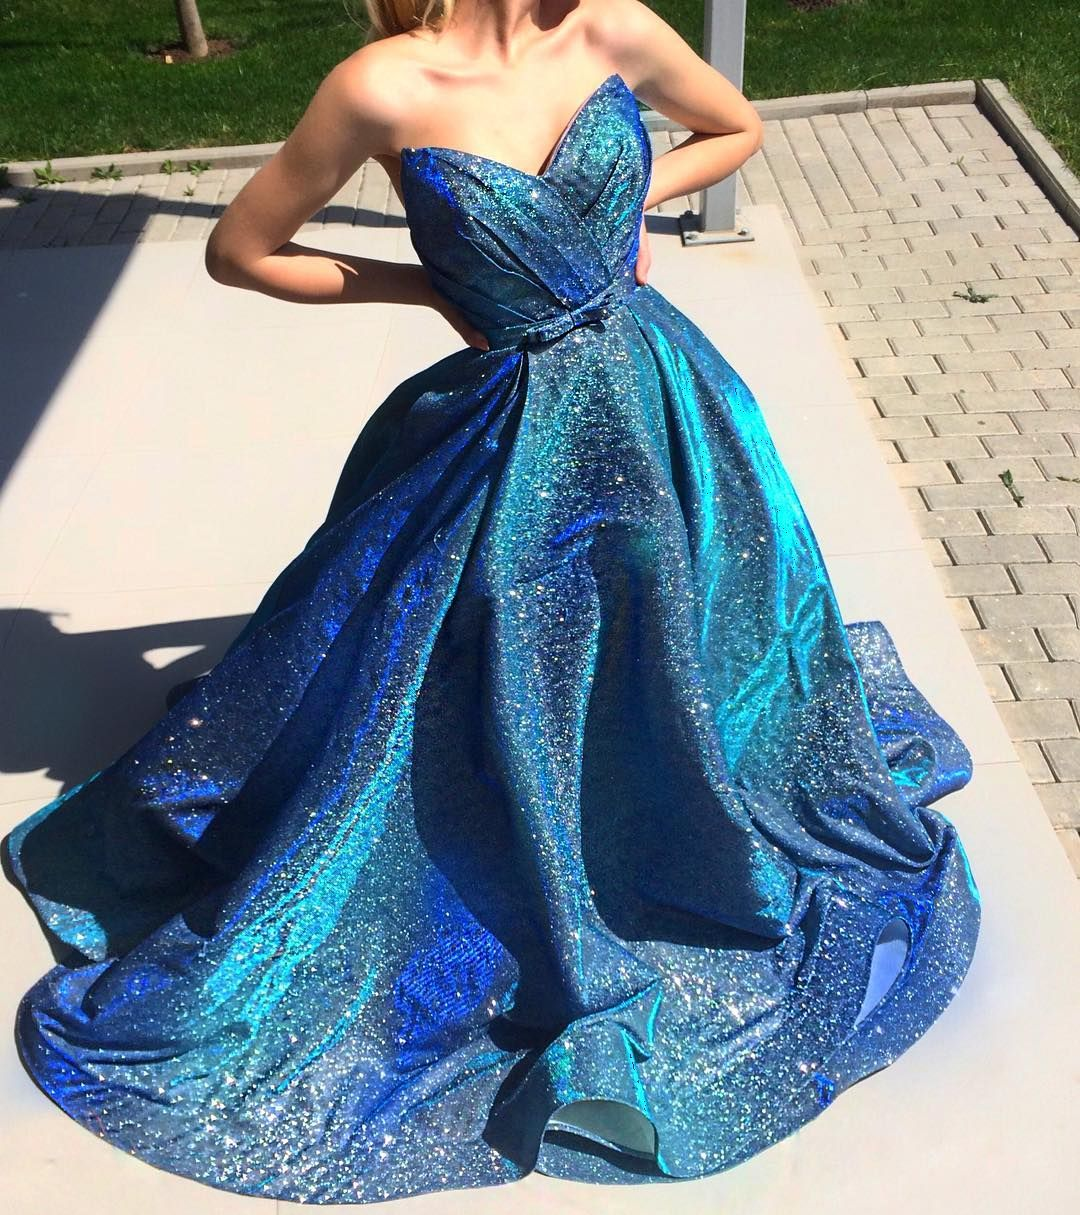 Teutamatoshiduriqi Tmd Sneakpeek Galaxy Prom Dresses Modest Pretty Dresses Dresses [ 1215 x 1080 Pixel ]